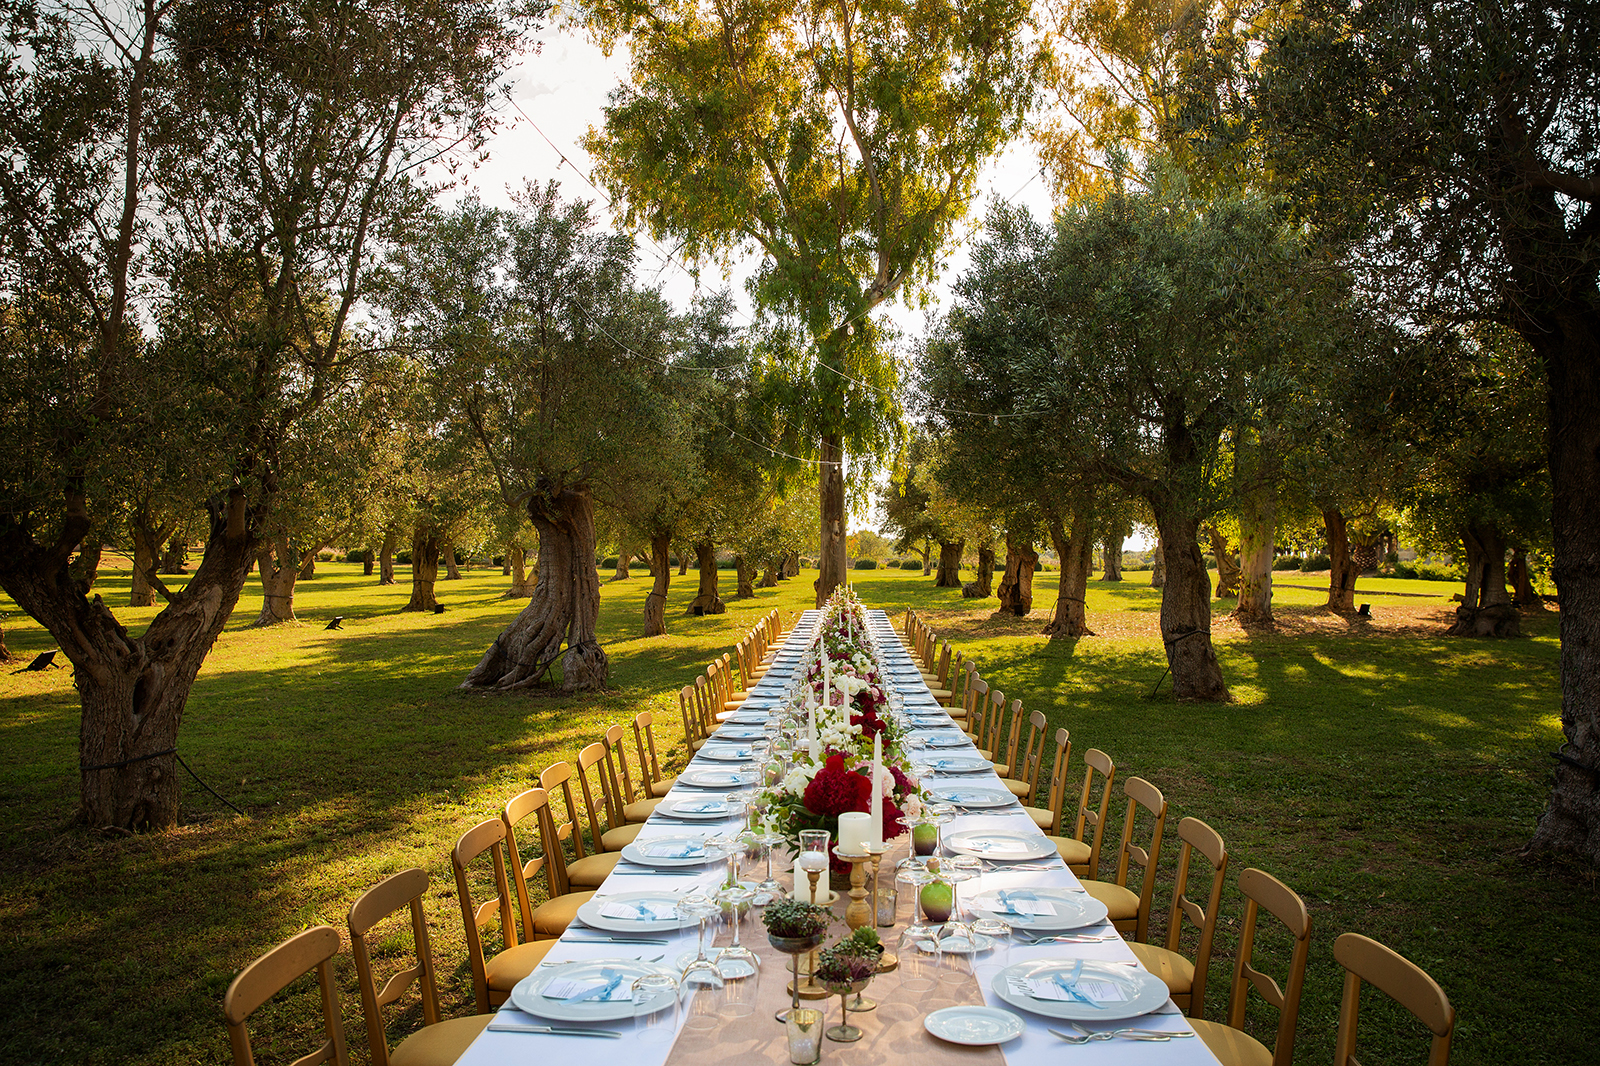 Masseria Torre Ruggeri - fotografo per matrimoni in Puglia